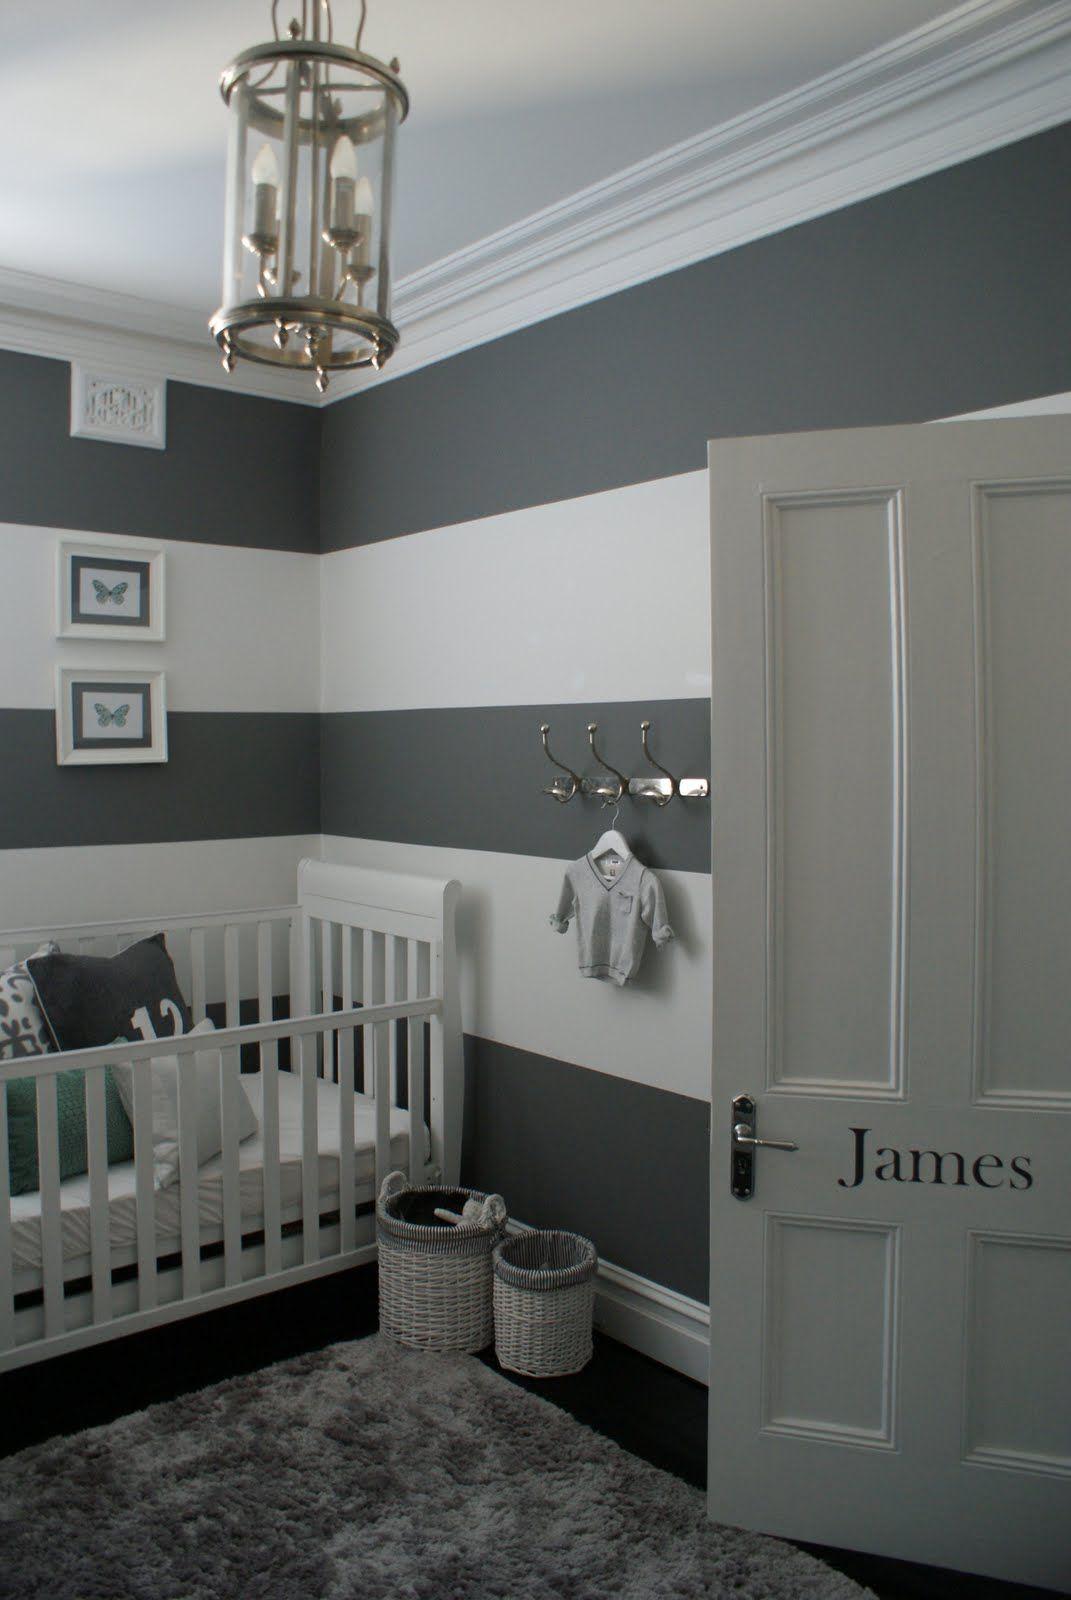 Best More Nursery Rhymes Grey Striped Walls Baby Boy Rooms 400 x 300